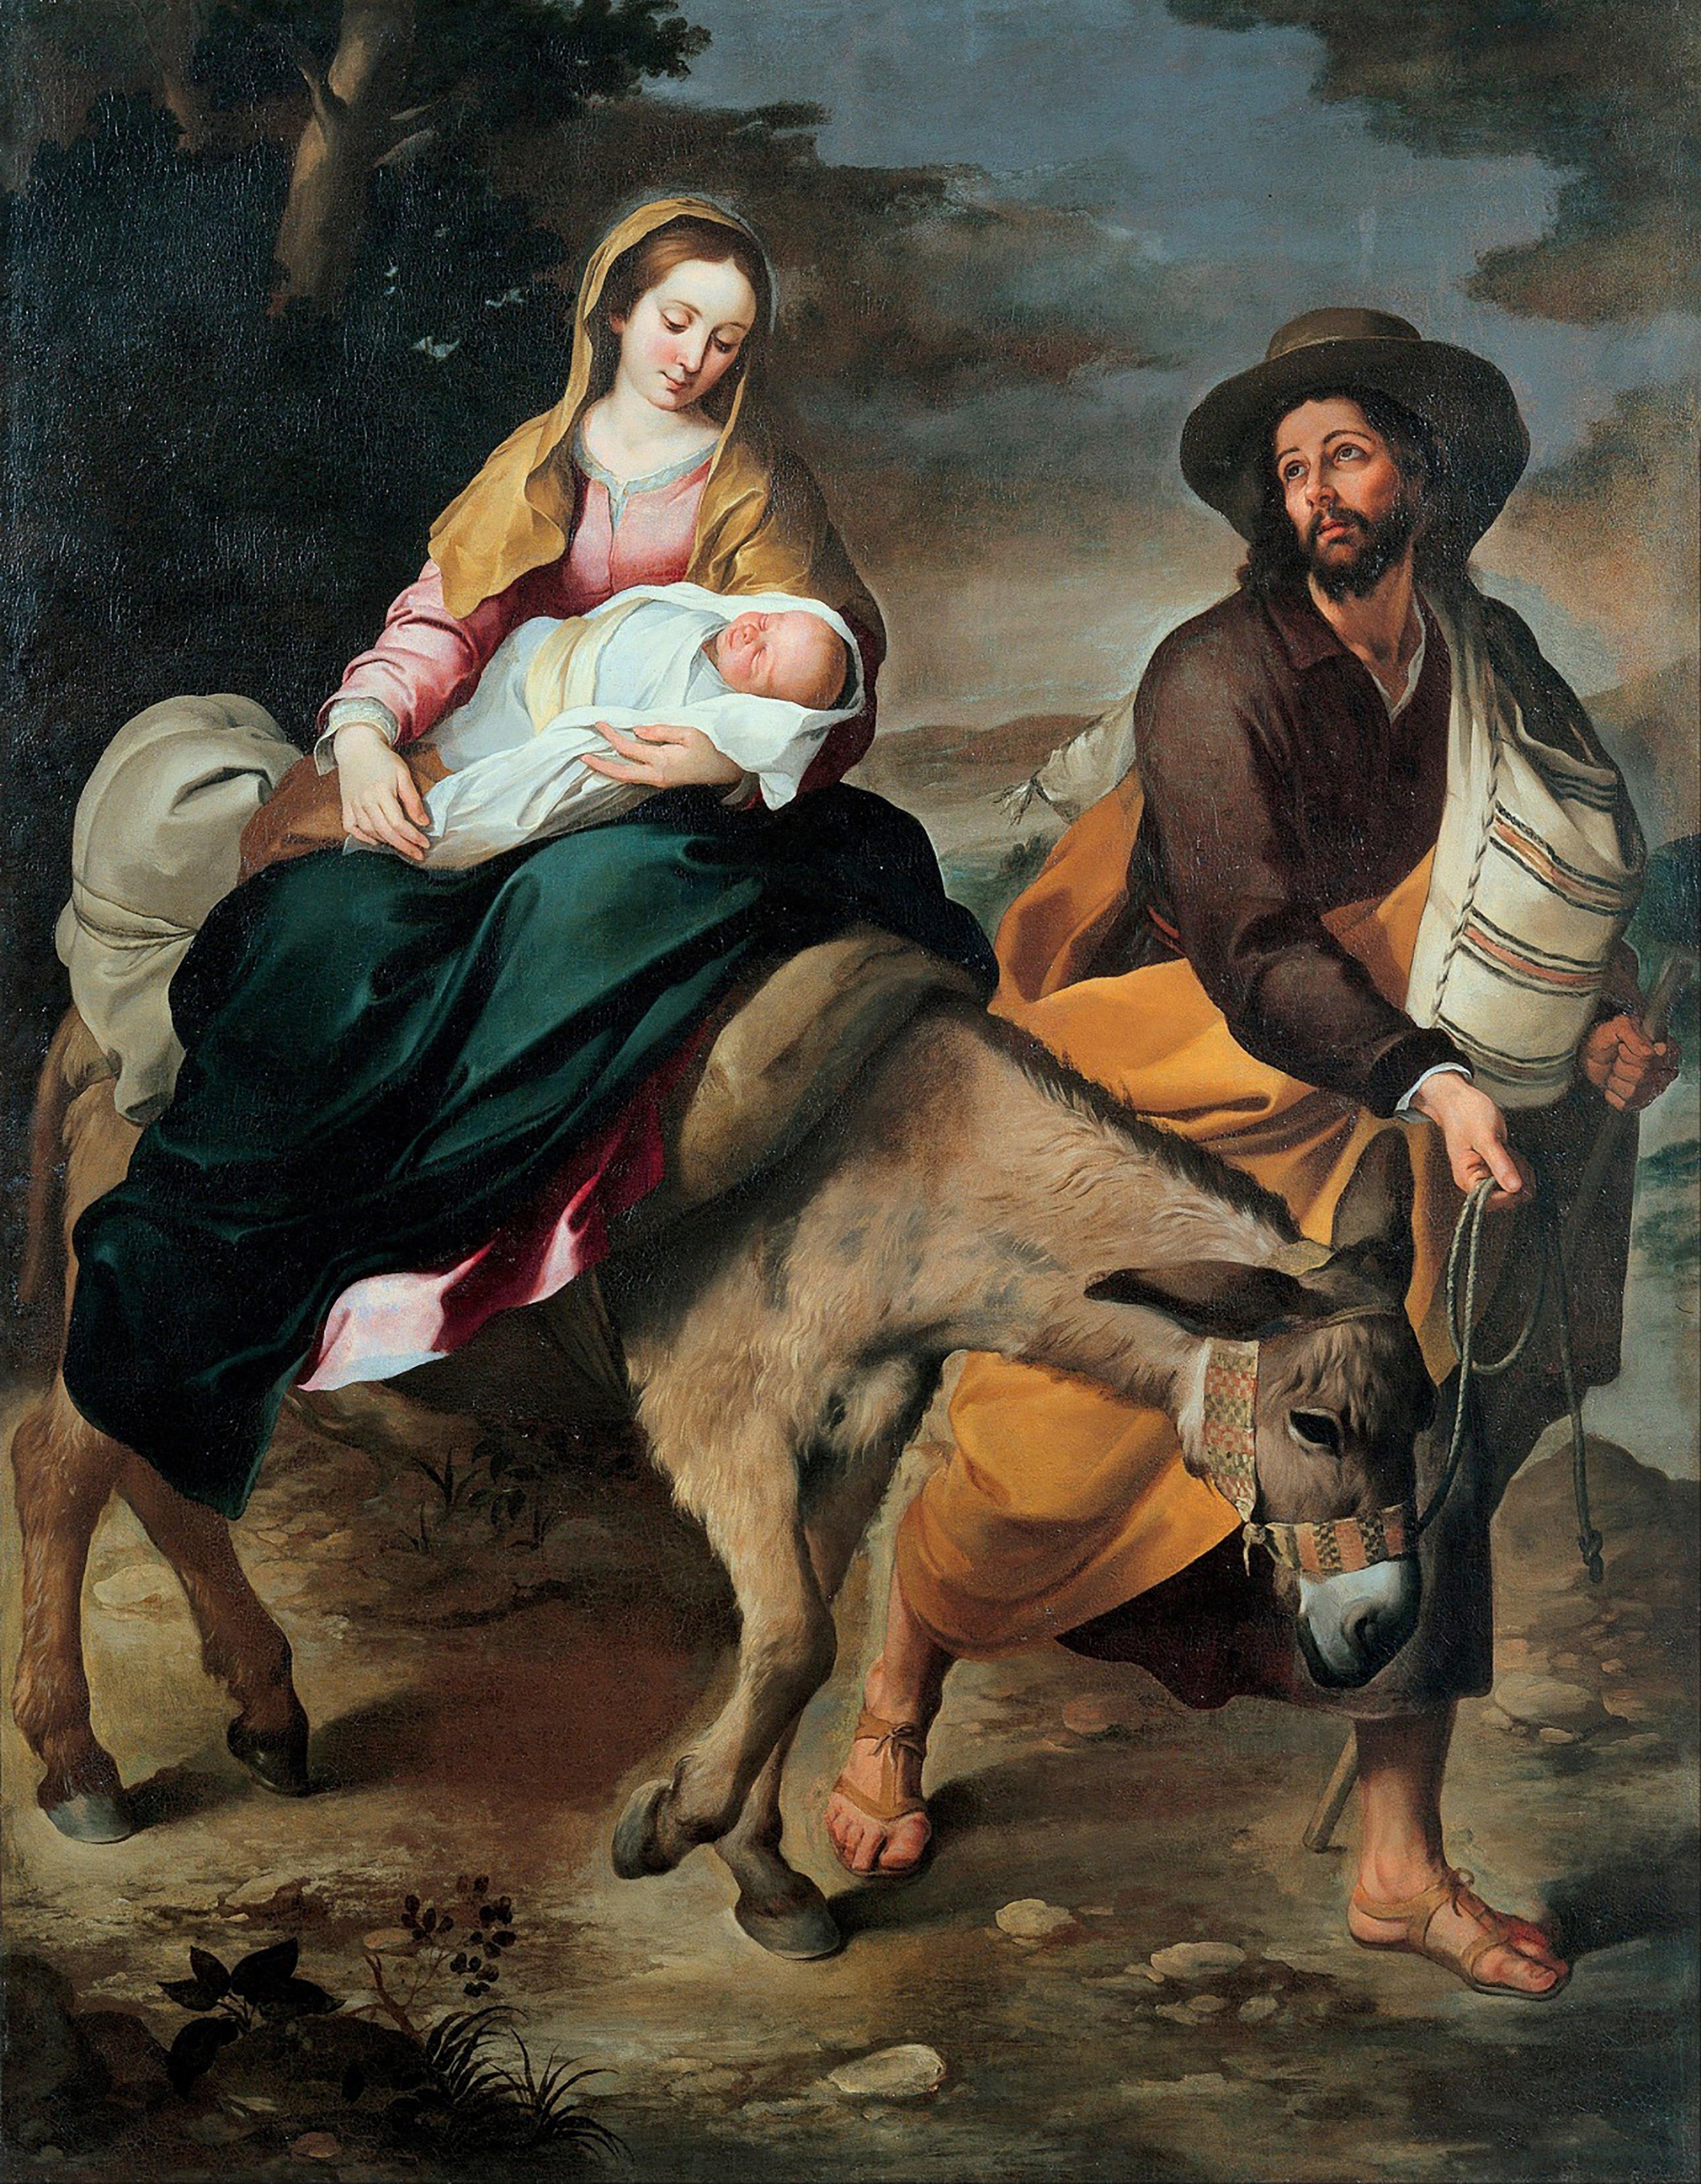 Sagrada Família de Nazaré, a fuga para o Egito